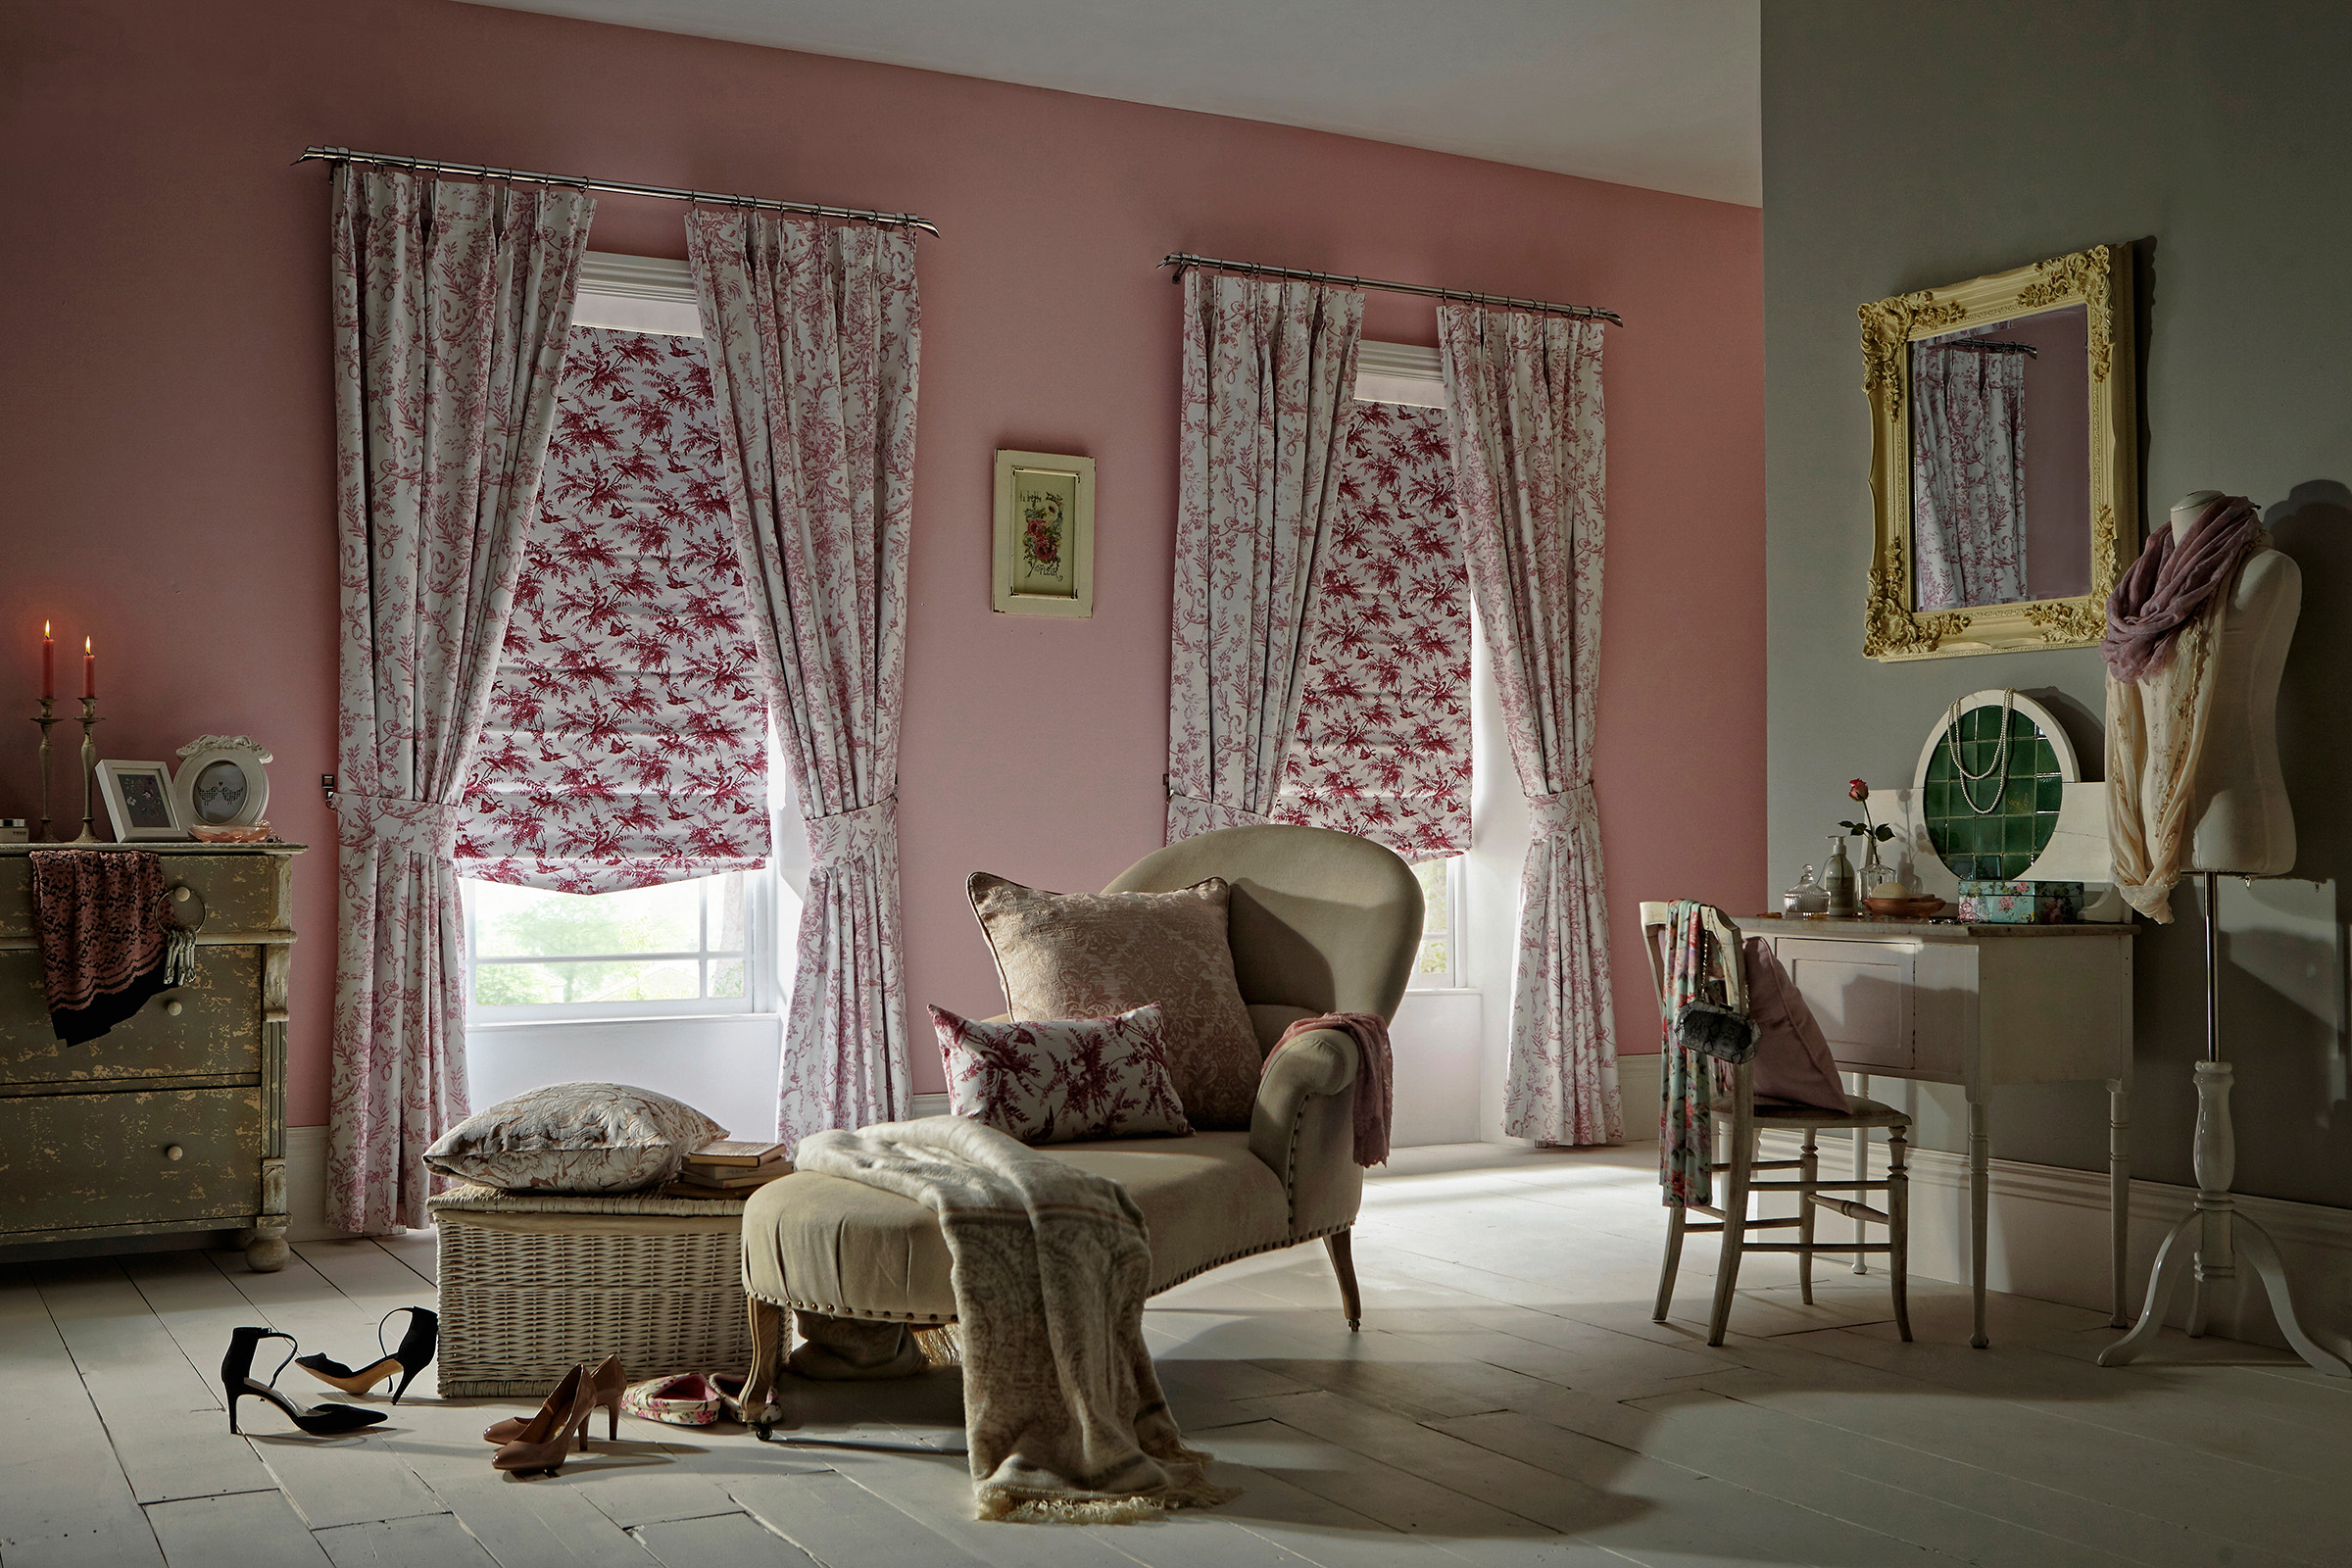 Mertan Rose Curtain_Piamento Rose Roman Room.jpg